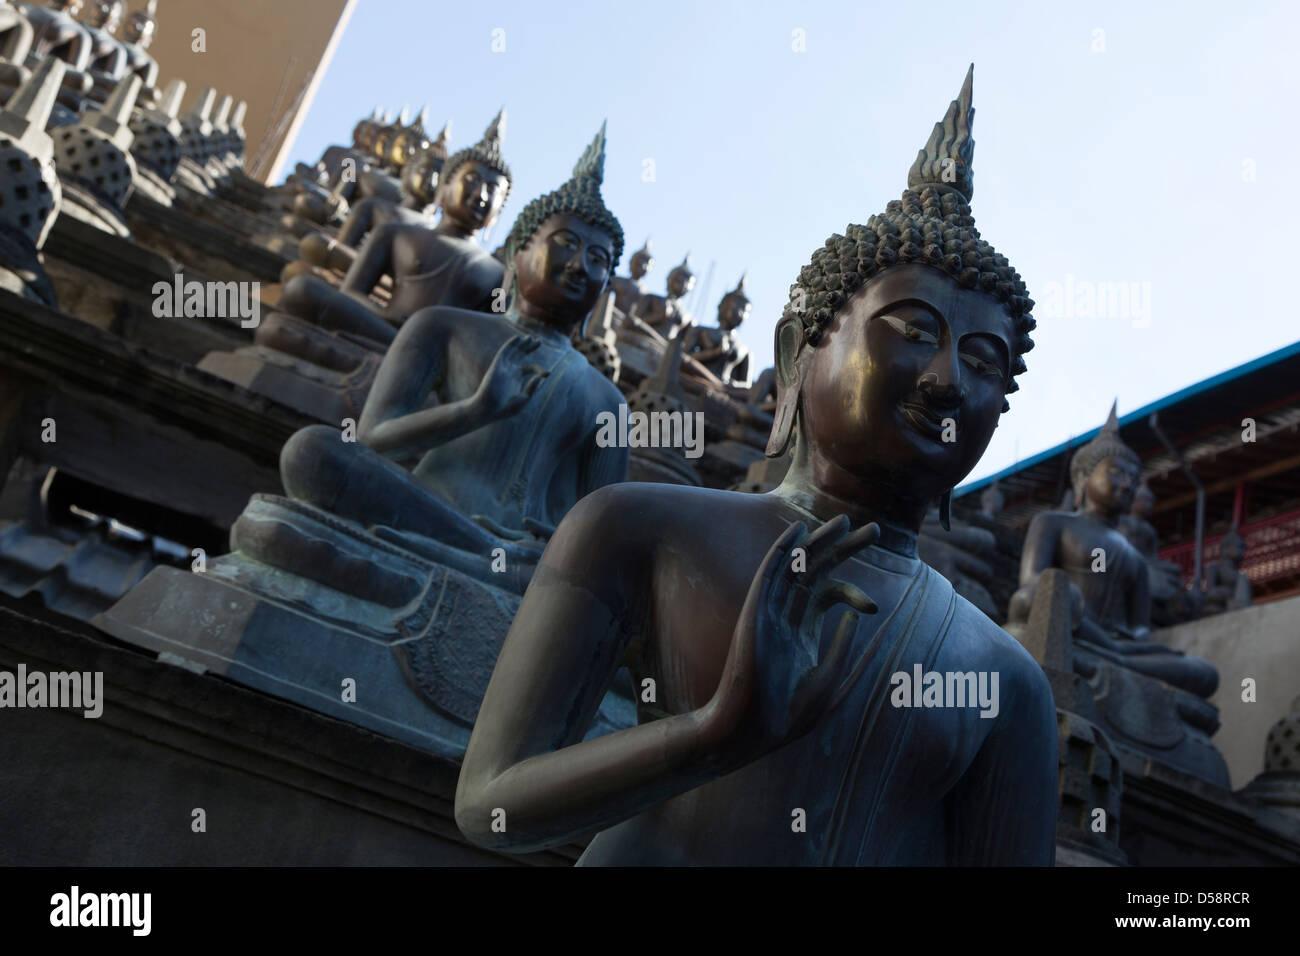 Eine Wiederholung der Buddha-Statuen im Gangaramaya Tempel in Colombo, Sri Lanka Stockbild